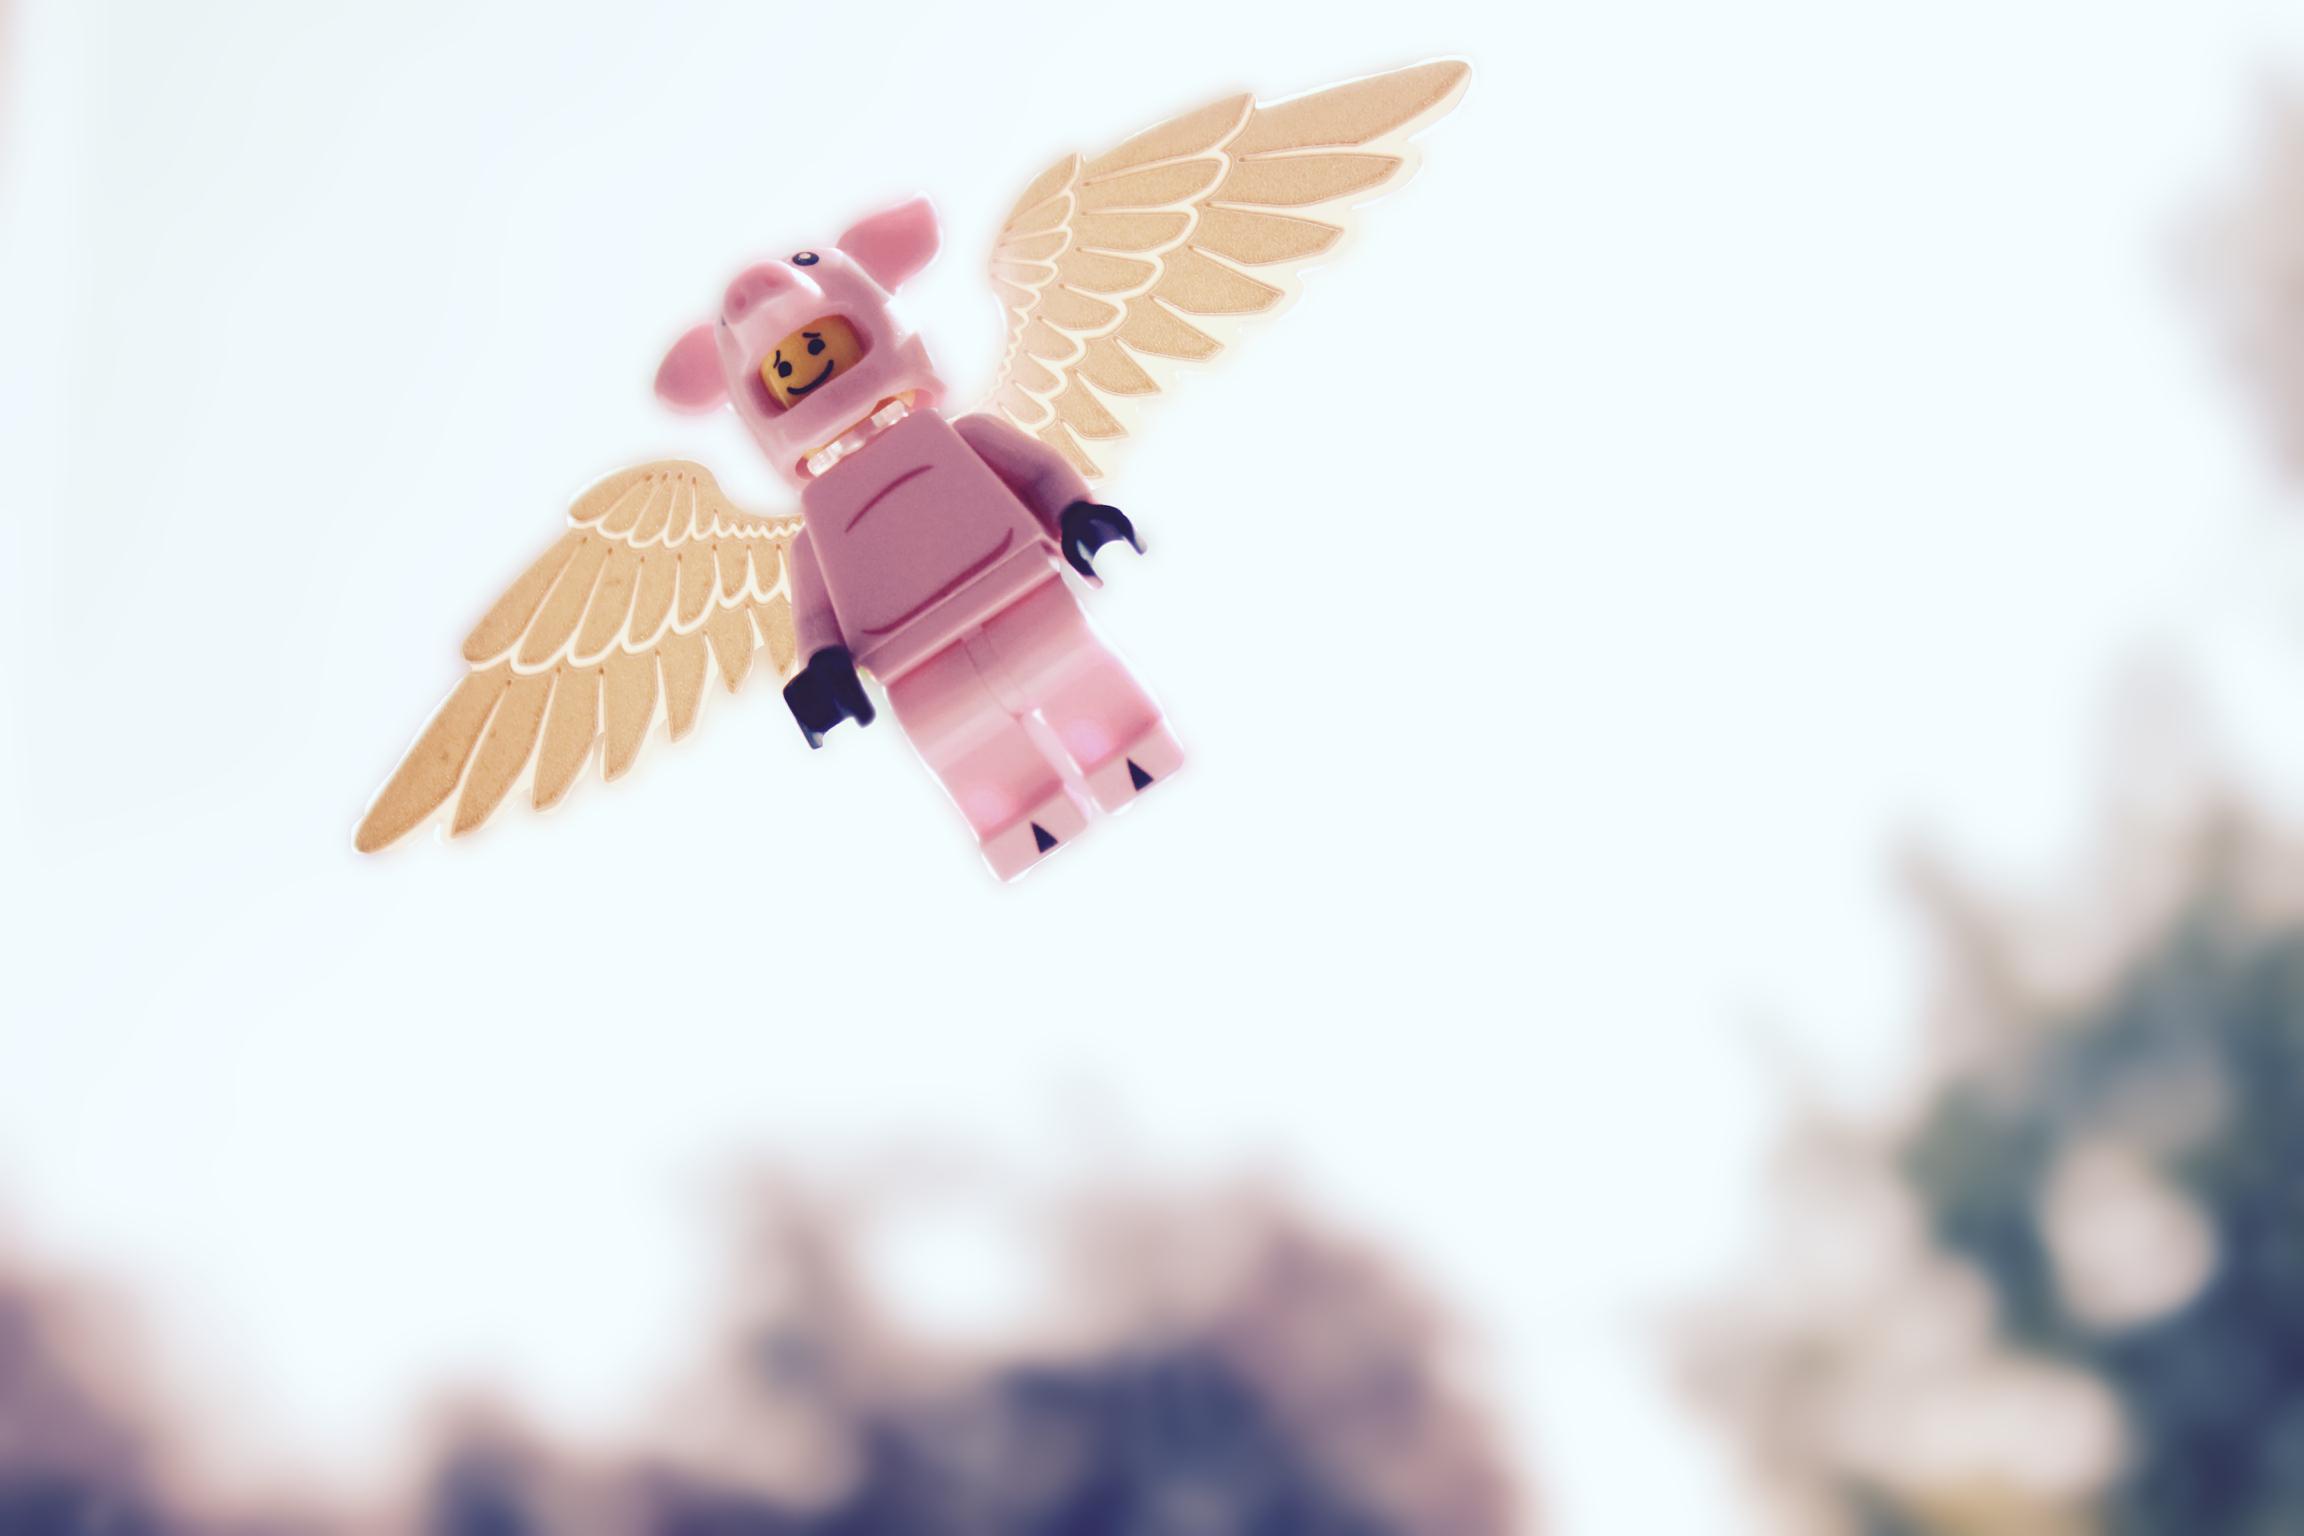 lego-pig-fly